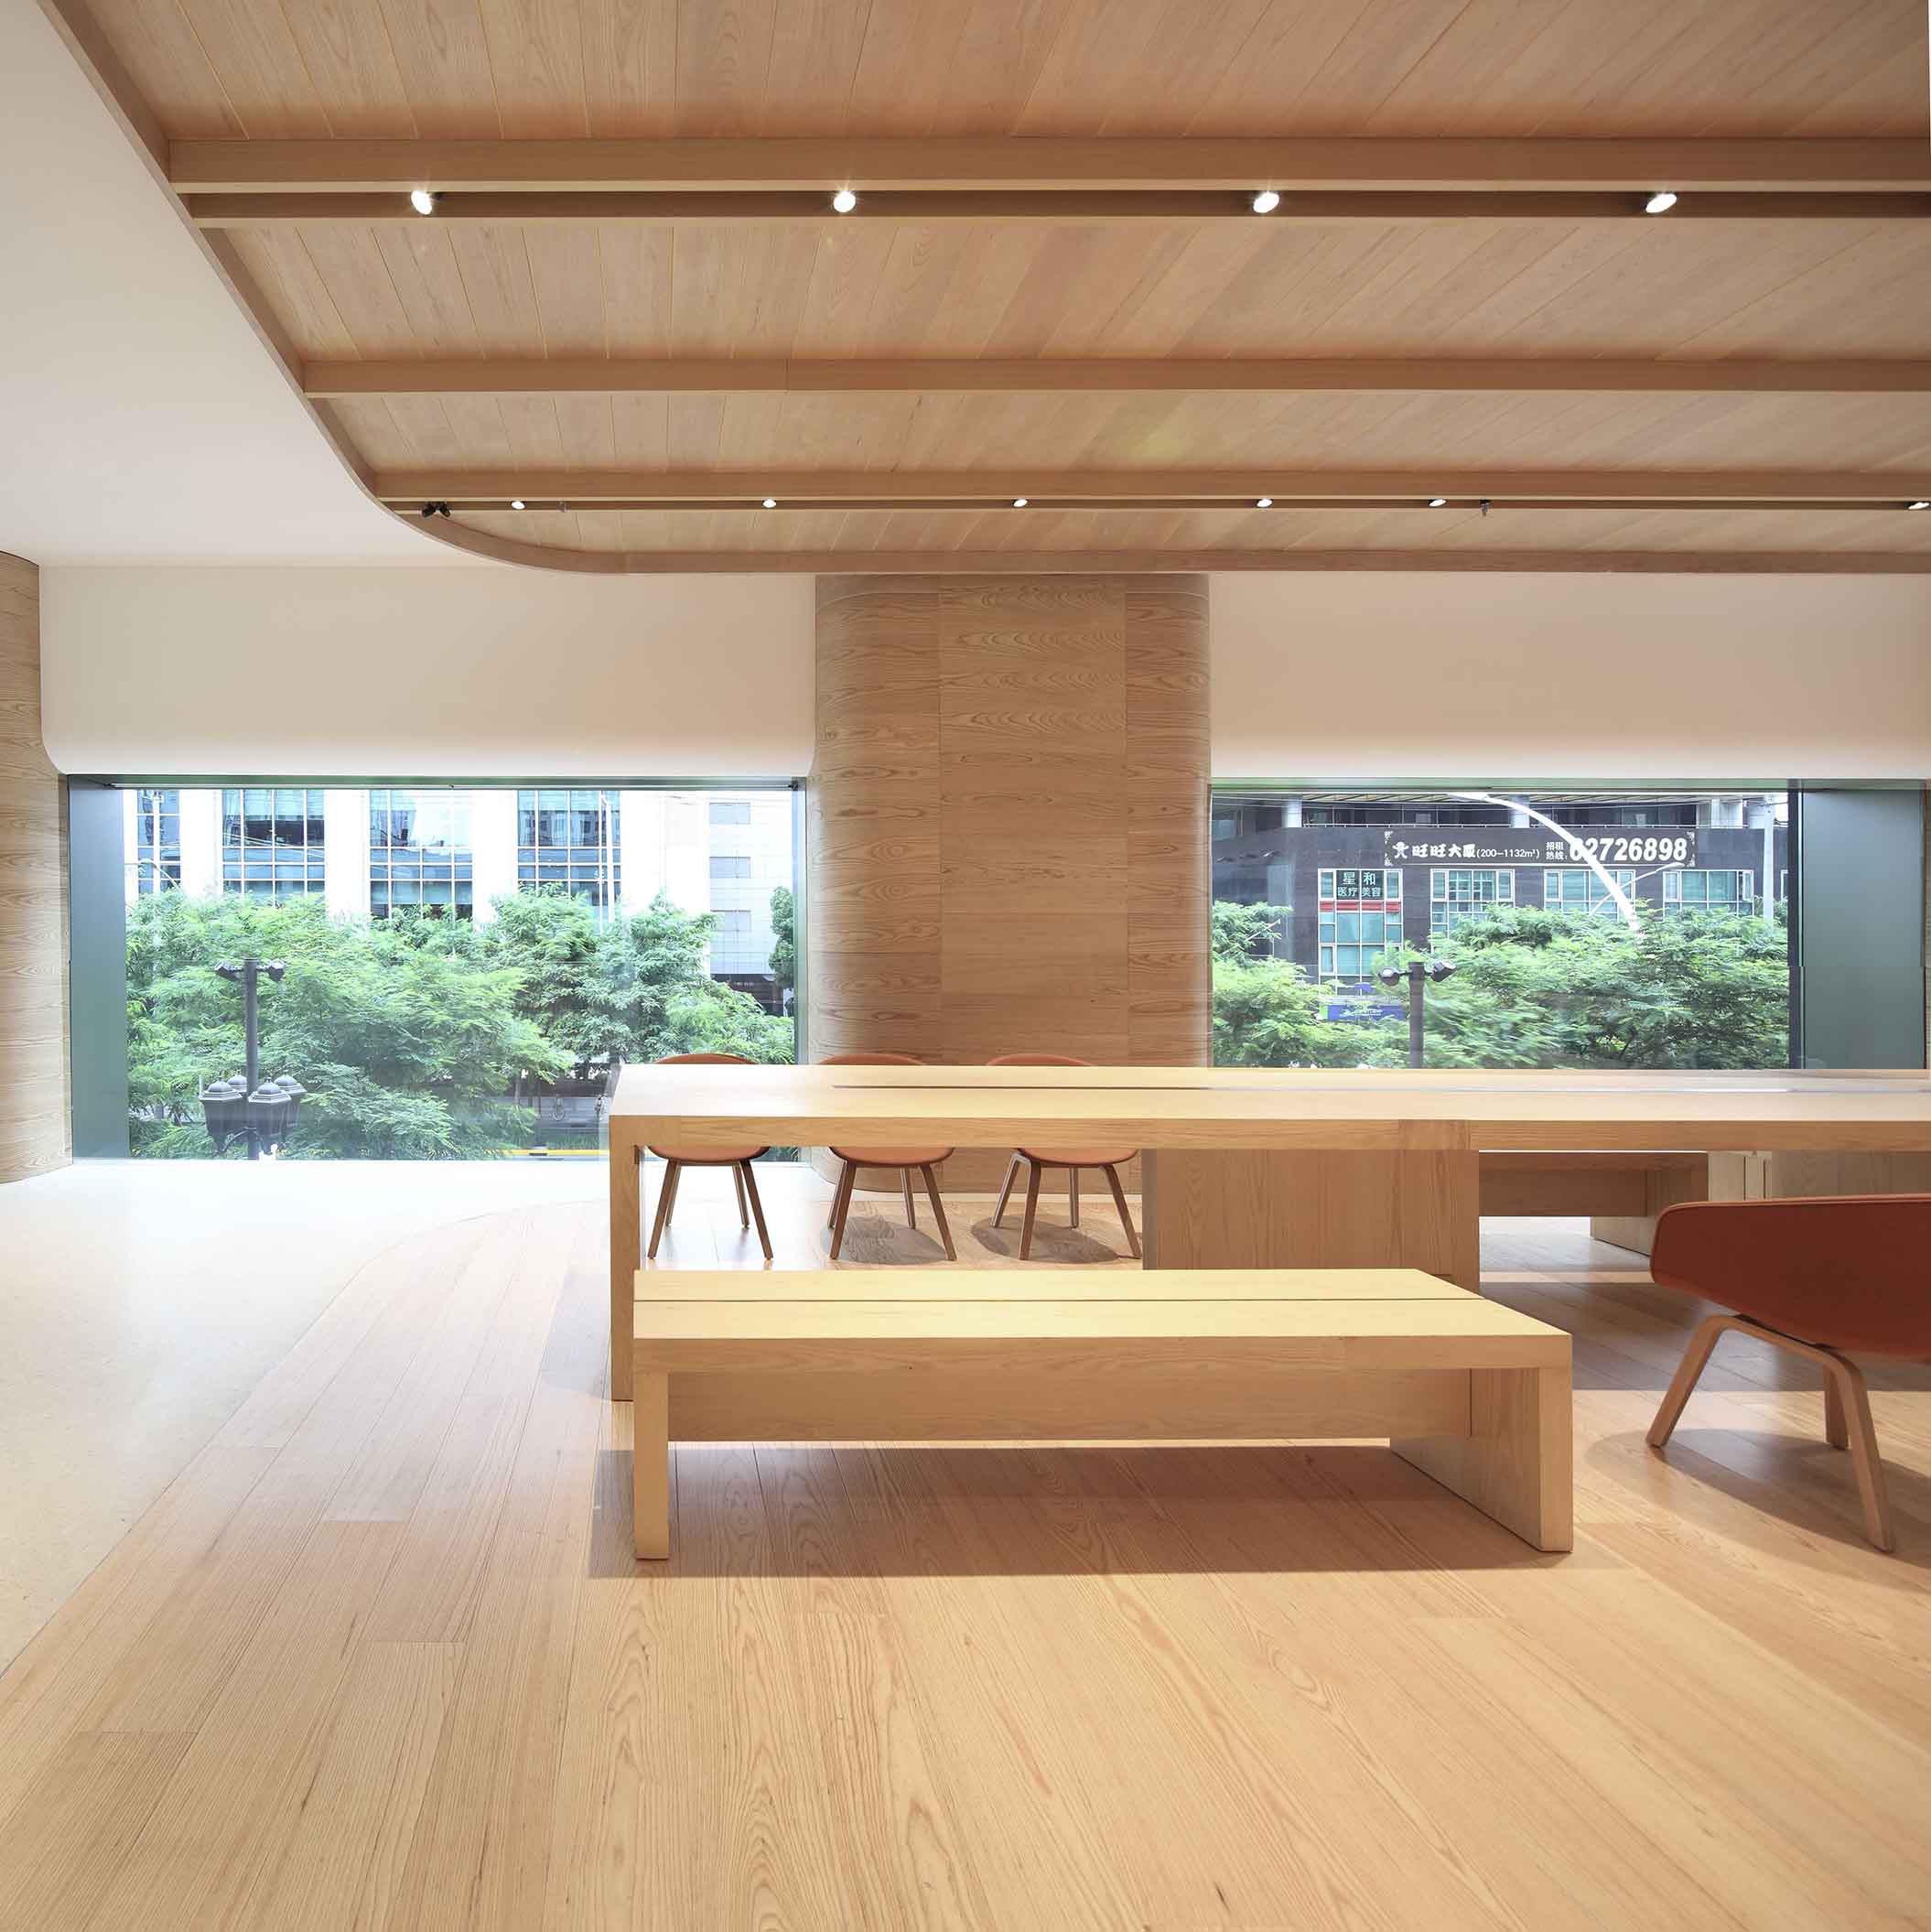 raams-architecture-studio-design-german-roig-garcia-architect-electric-car-coche-electrico-shanghai-china-nio-house-SHL_NIO-Showroom_@RawVision_06.jpg